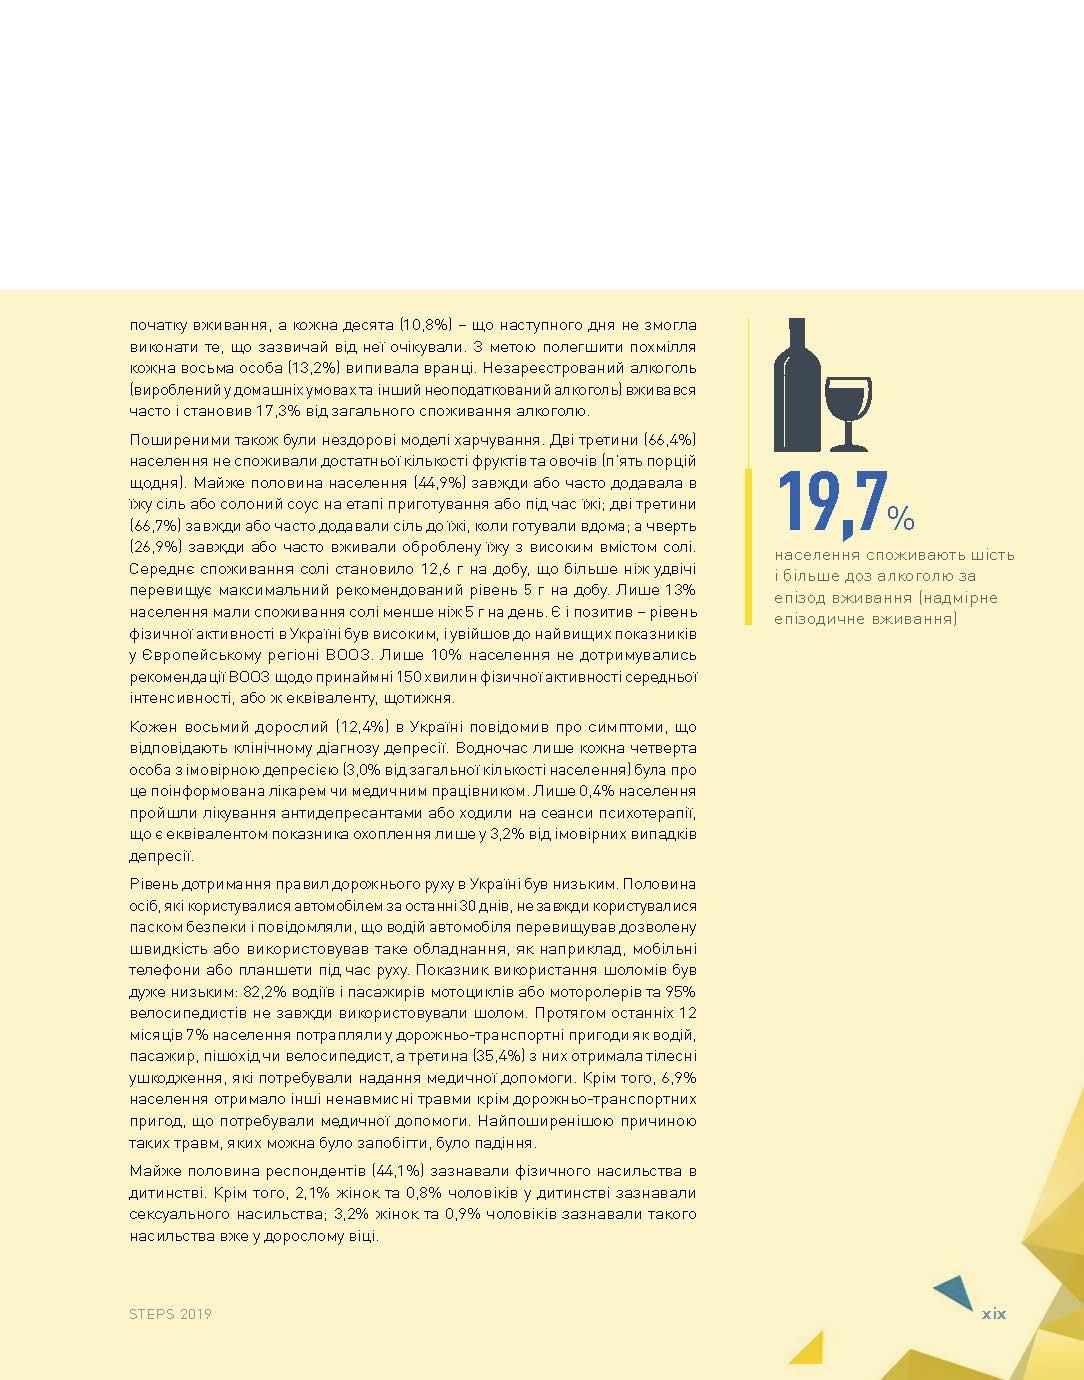 STEPS_Report_ukr_Страница_19